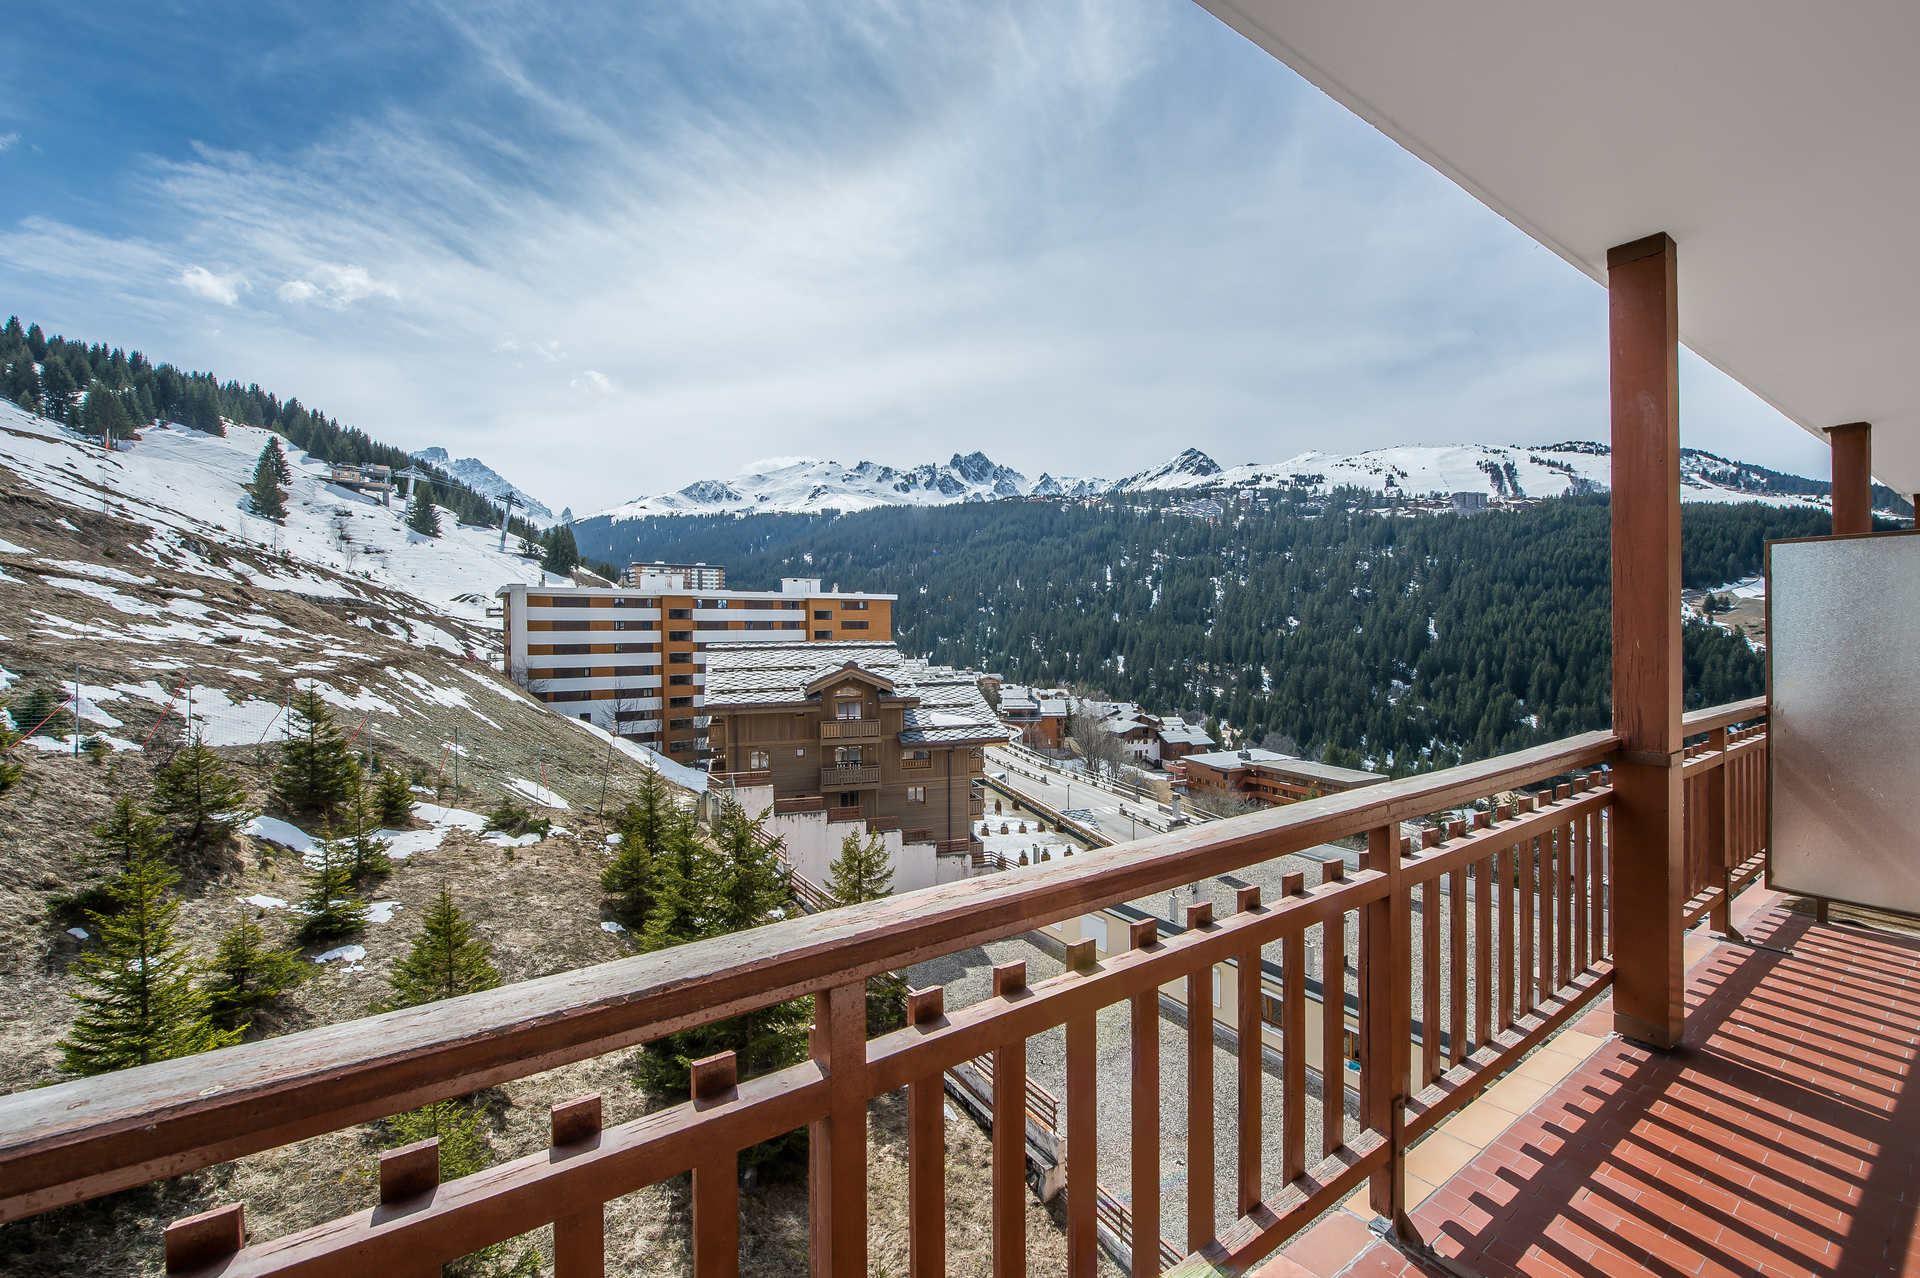 1 studio 4 personnes skis aux pieds / RESIDENCE 1650 18 (Montagne)